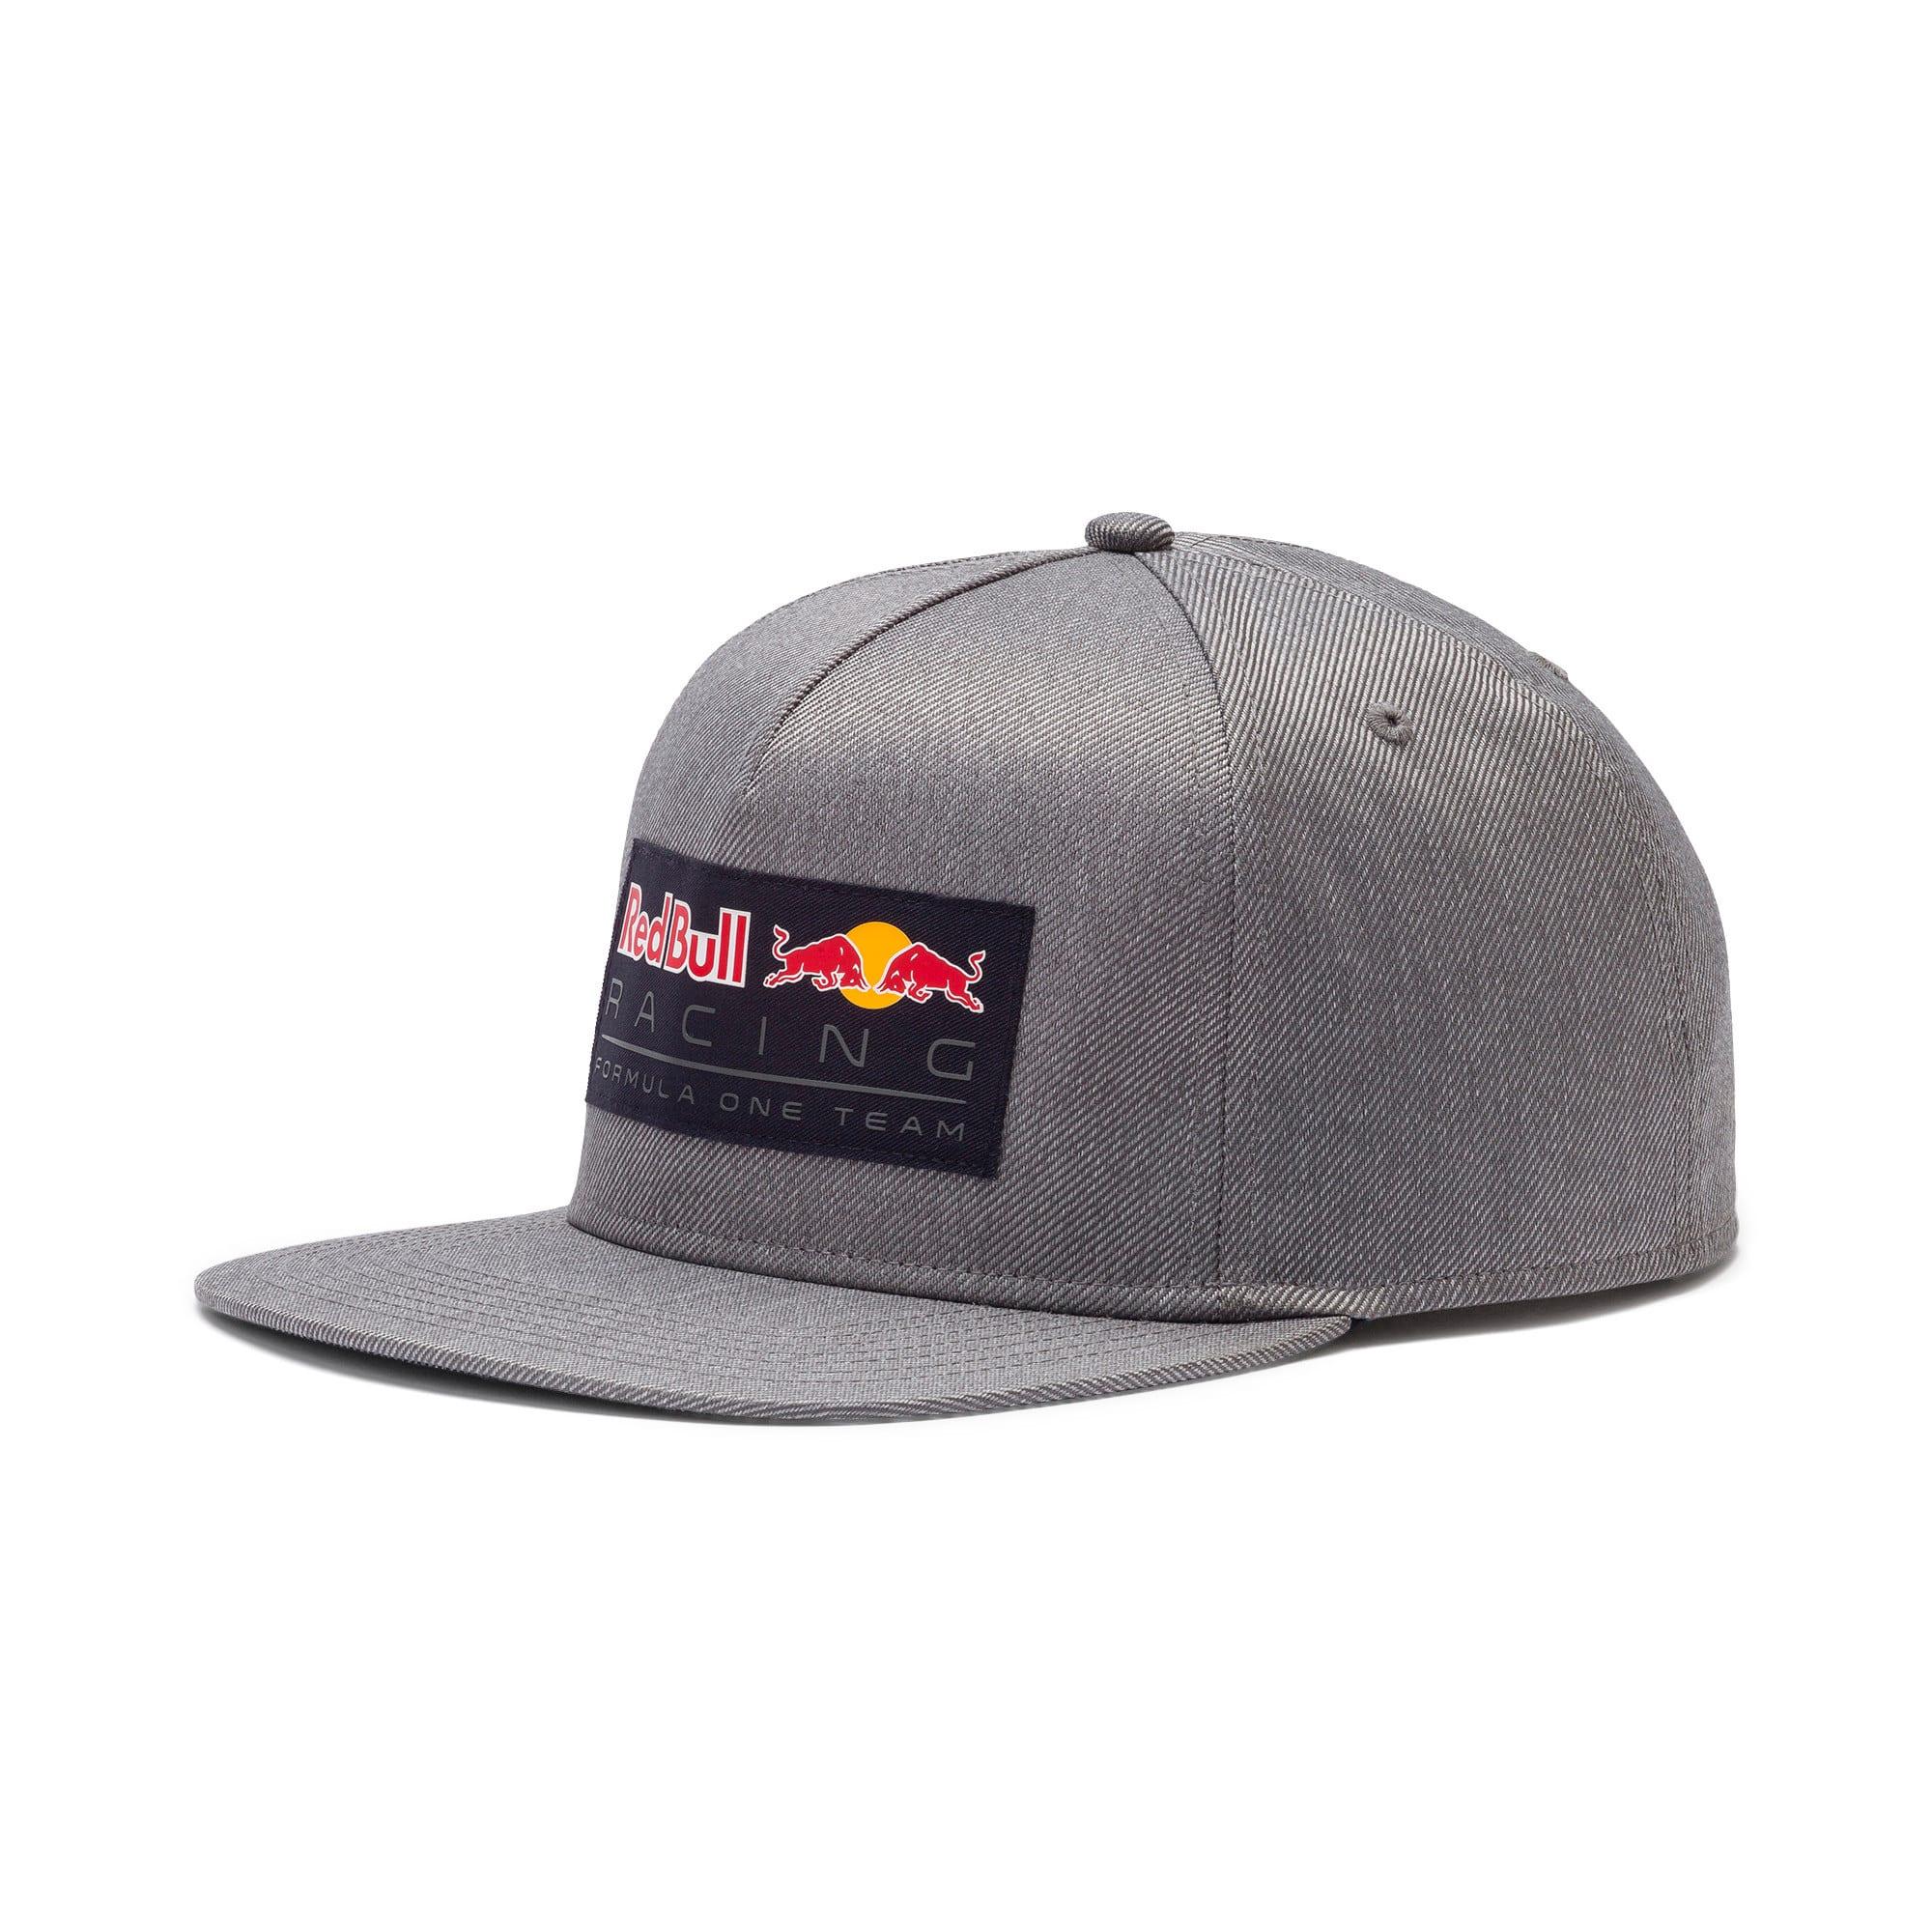 Thumbnail 1 of Red Bull Racing Lifestyle Flat Brim Cap, Smoked Pearl, medium